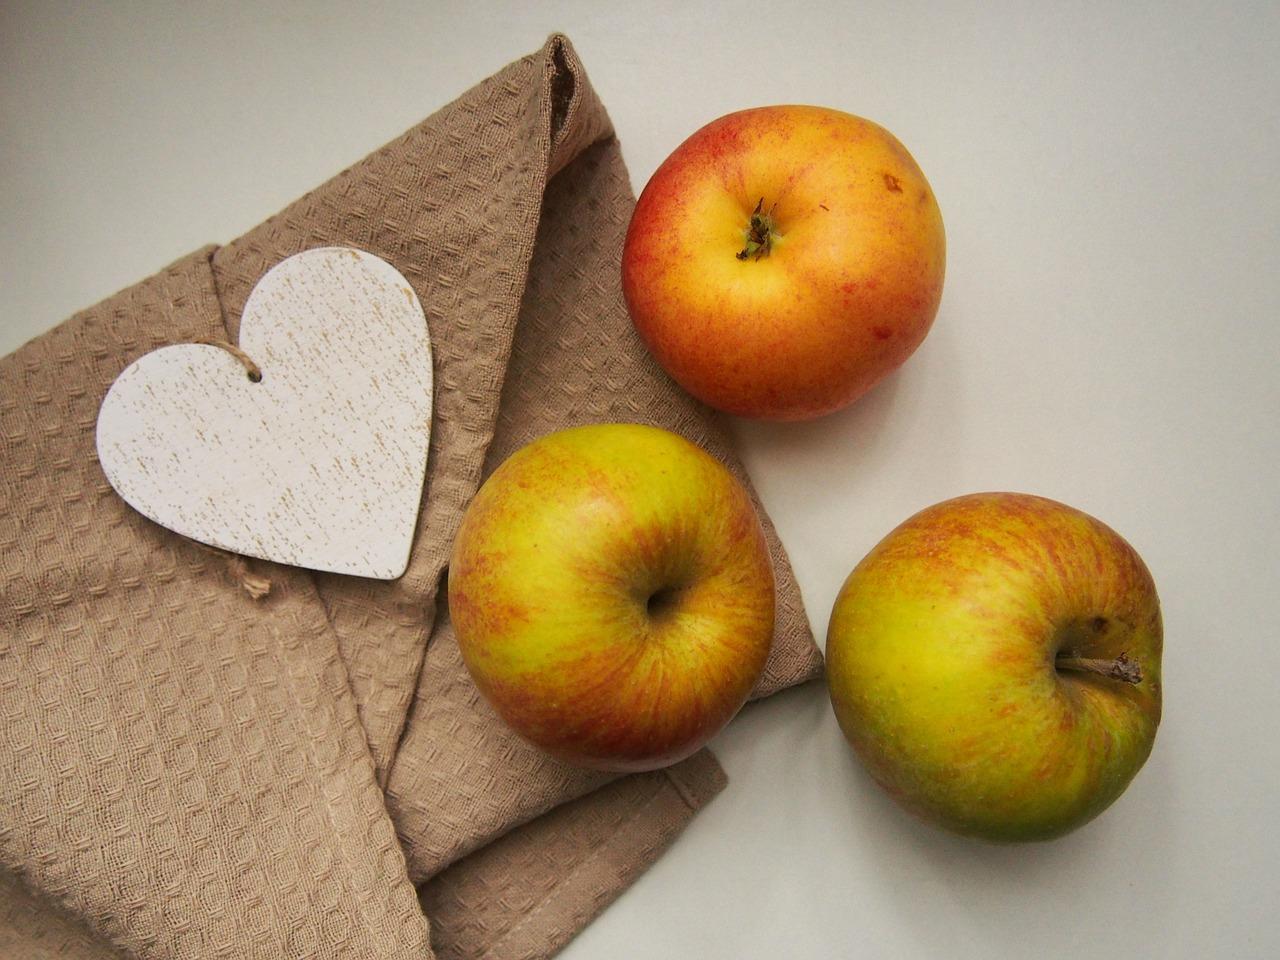 apples-923681 1280